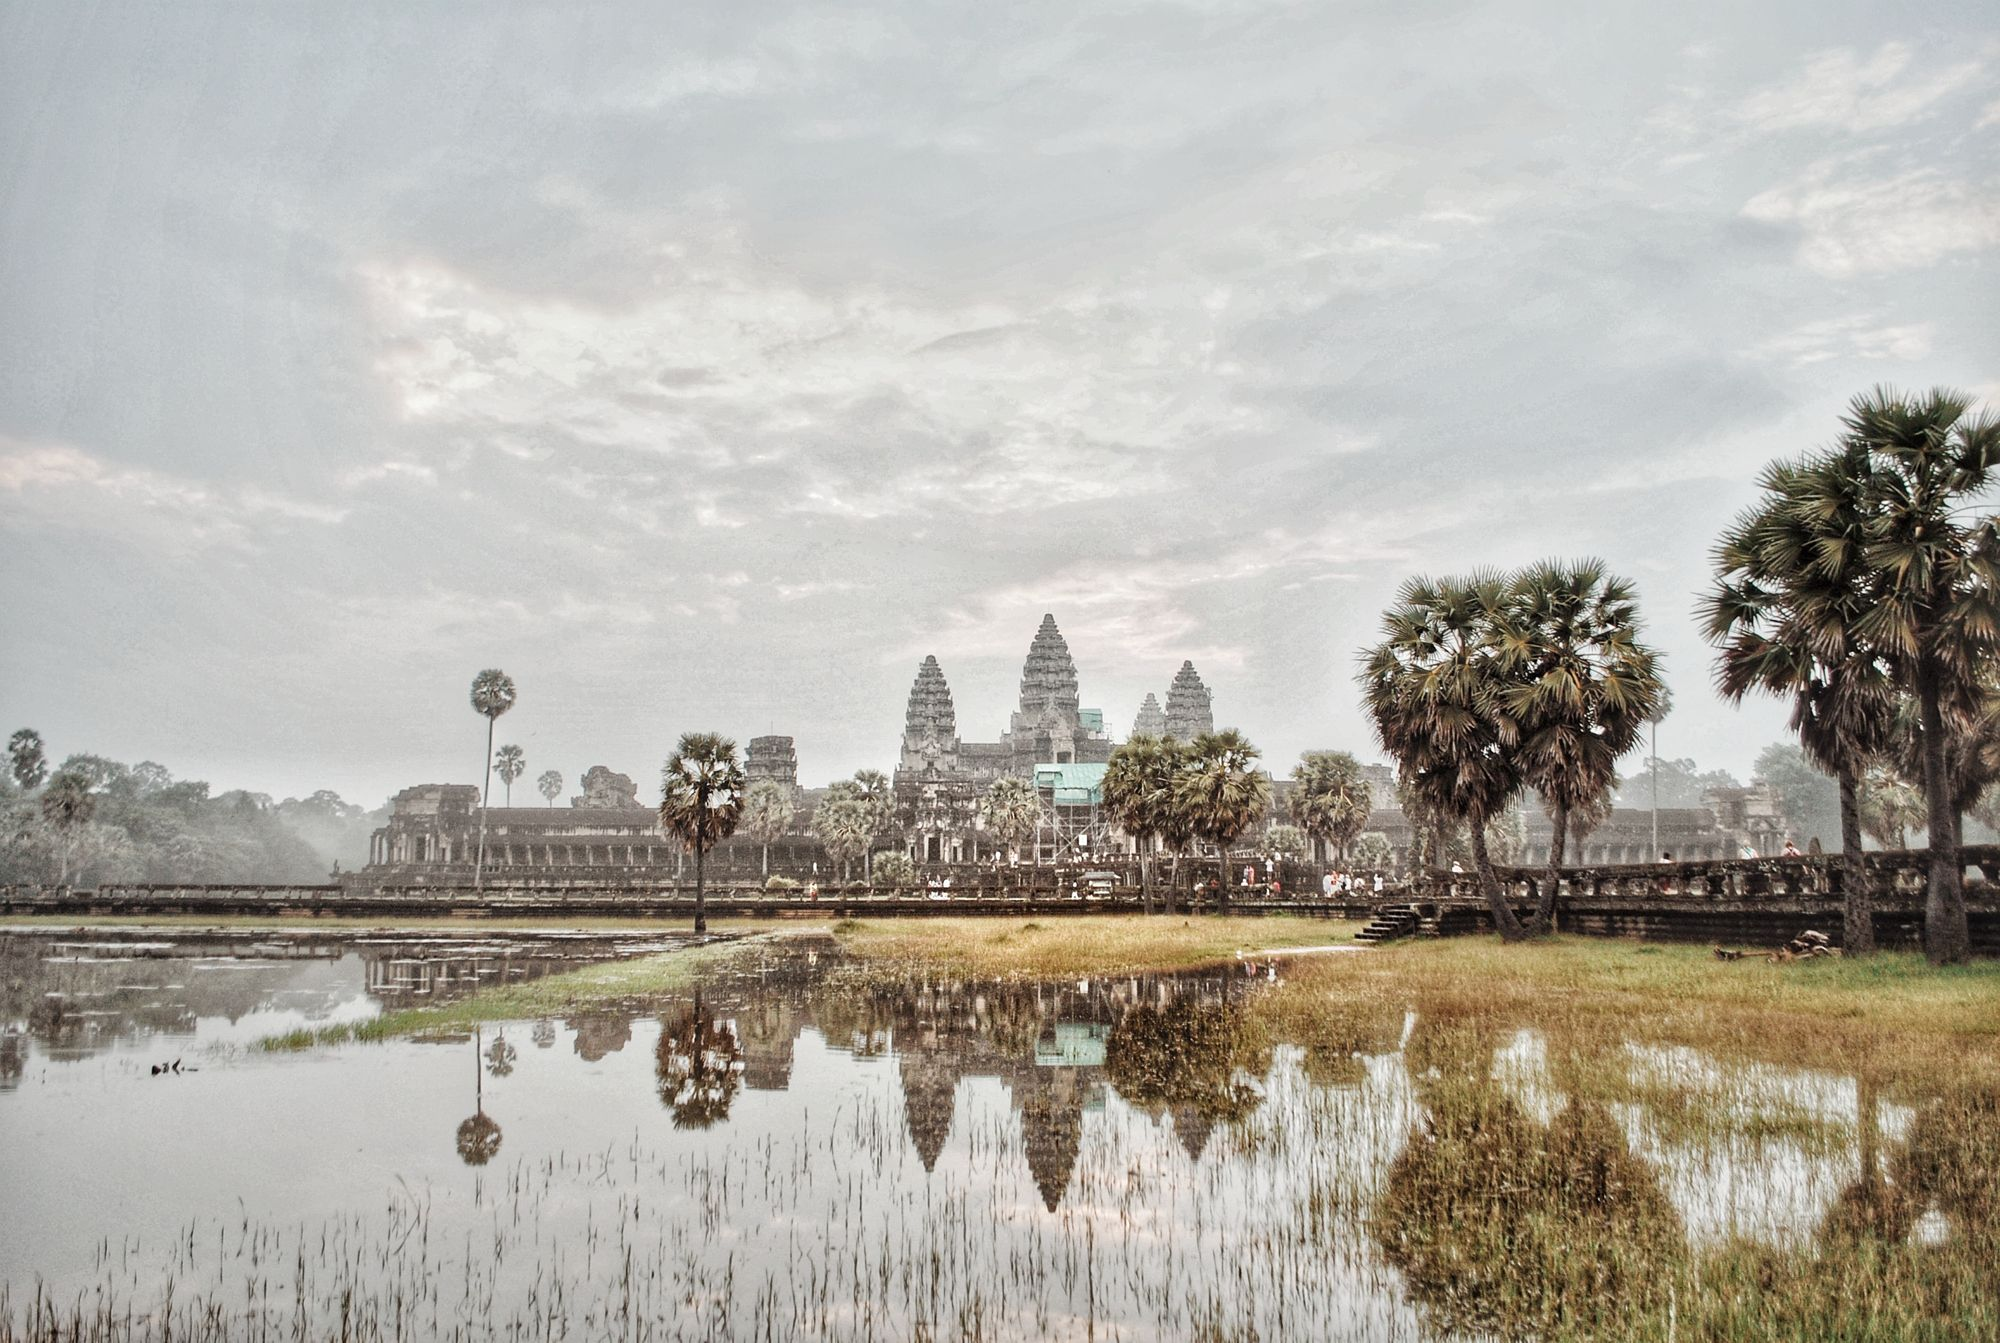 #angkor #temples #cambodge #siemreap #blogvoyage #voyage